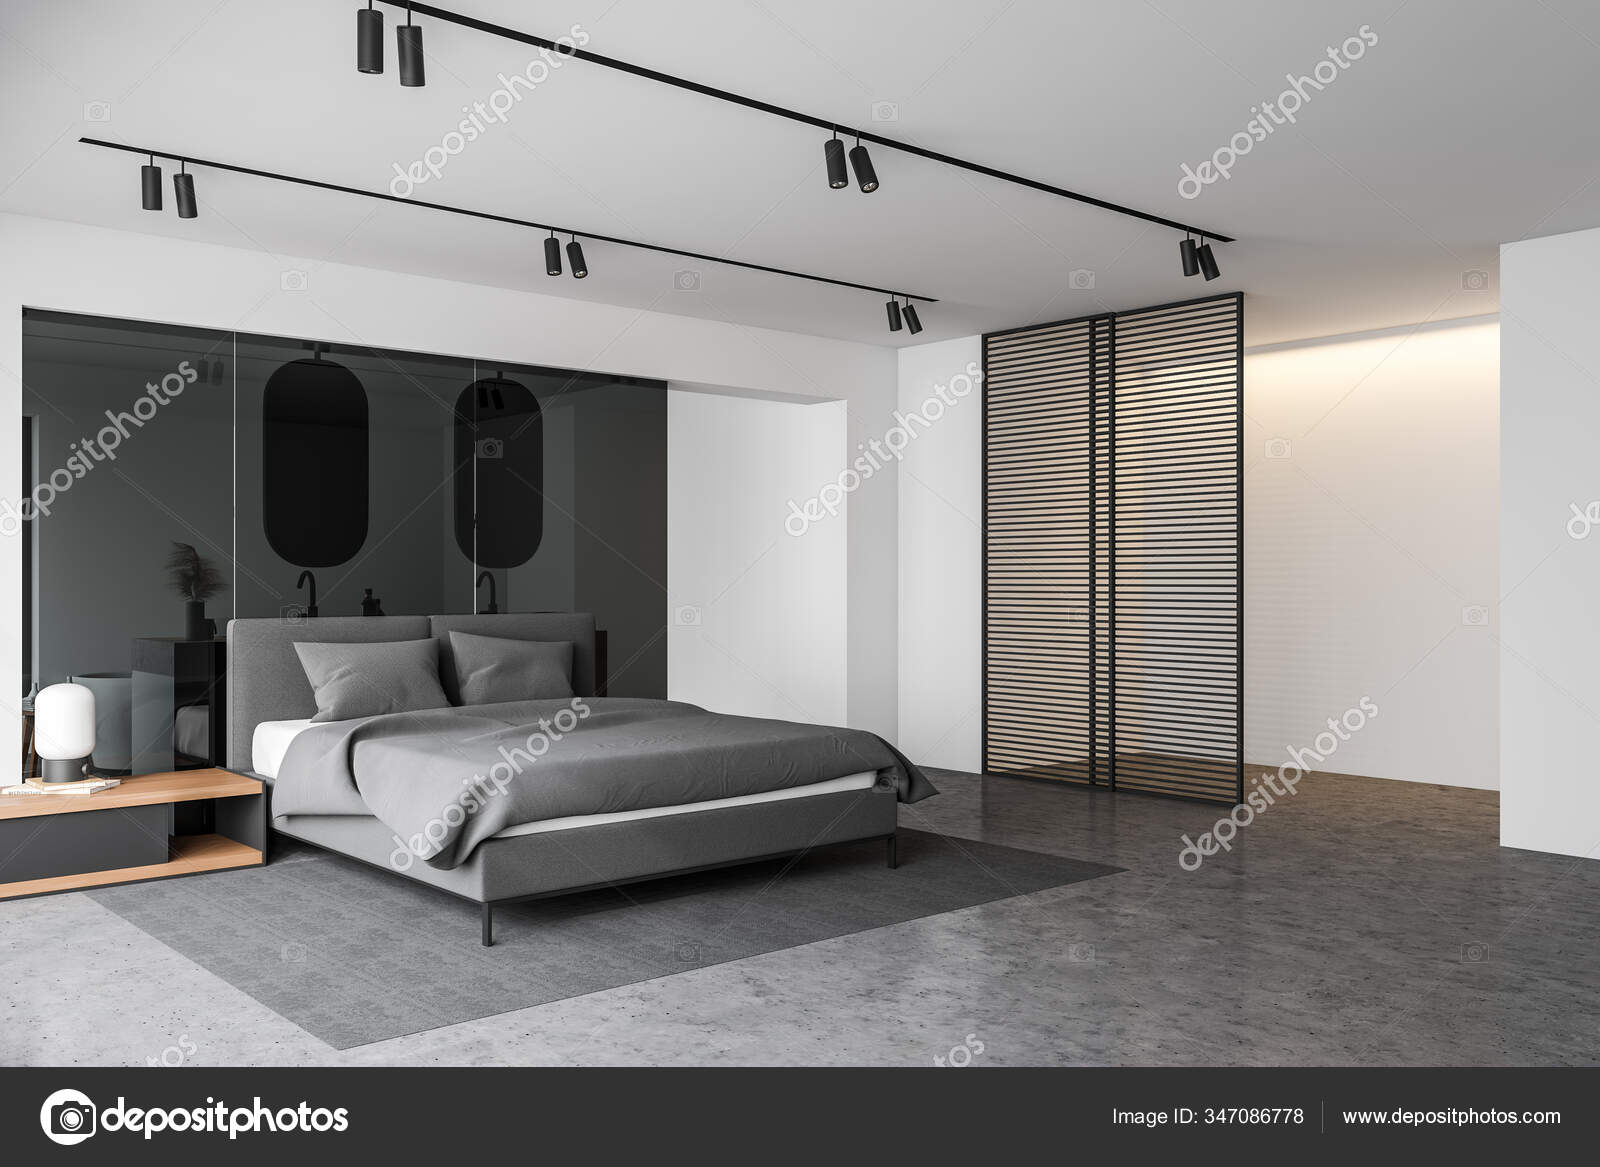 Corner Stylish Master Bedroom White Glass Walls Concrete Floor Comfortable Stock Photo C Denisismagilov 347086778